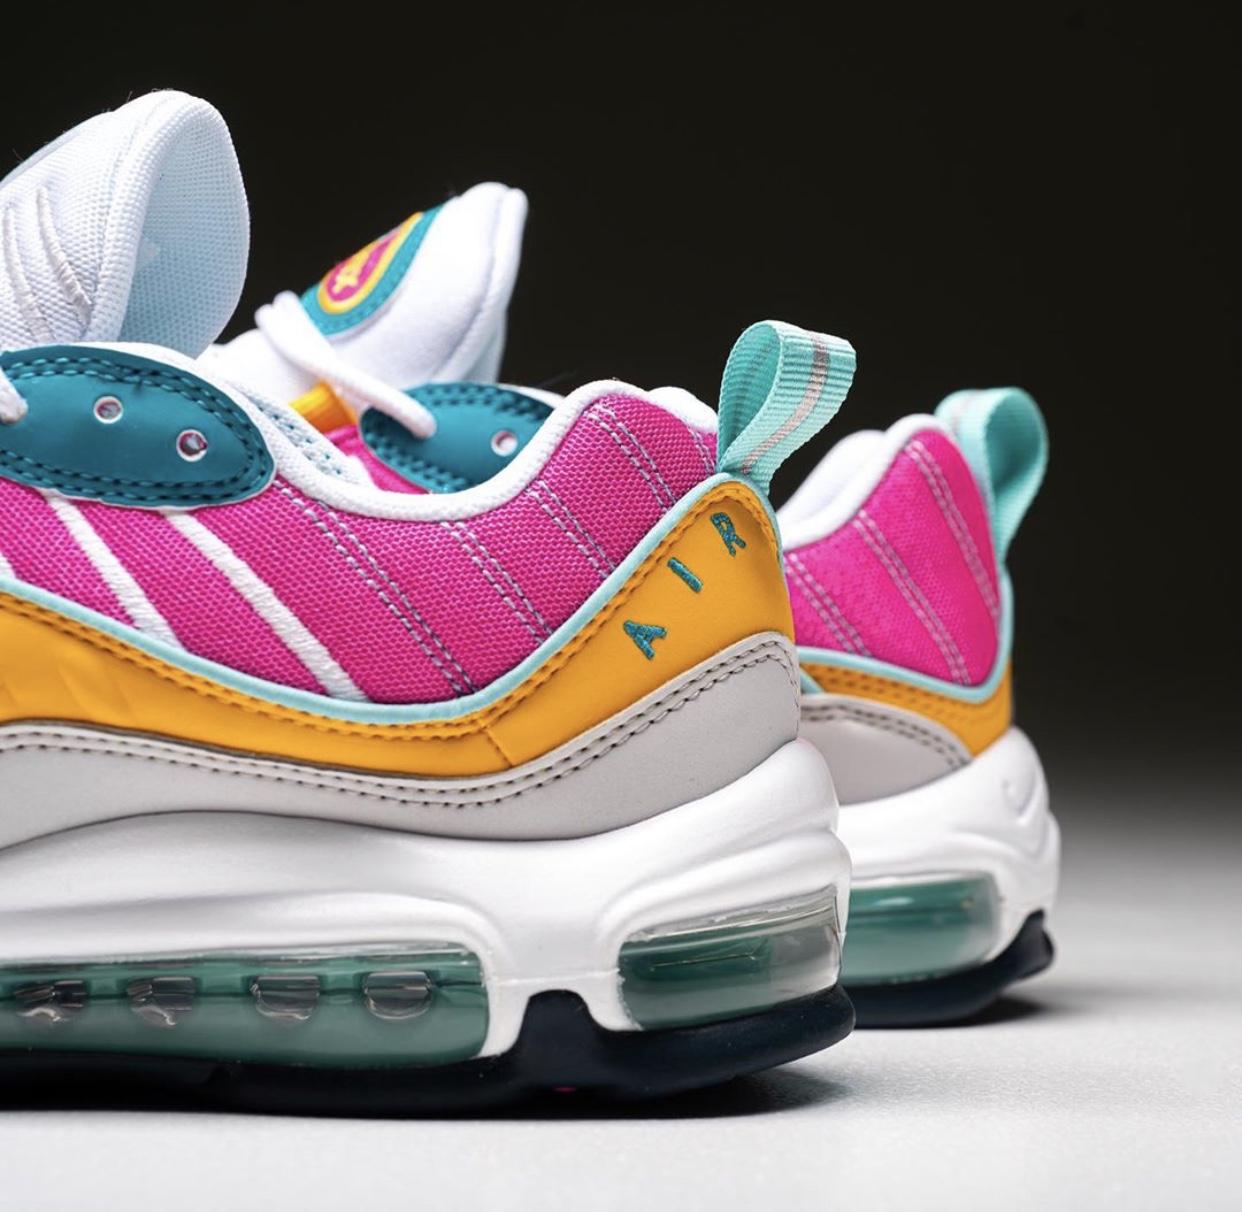 Image: Sneaker Politics